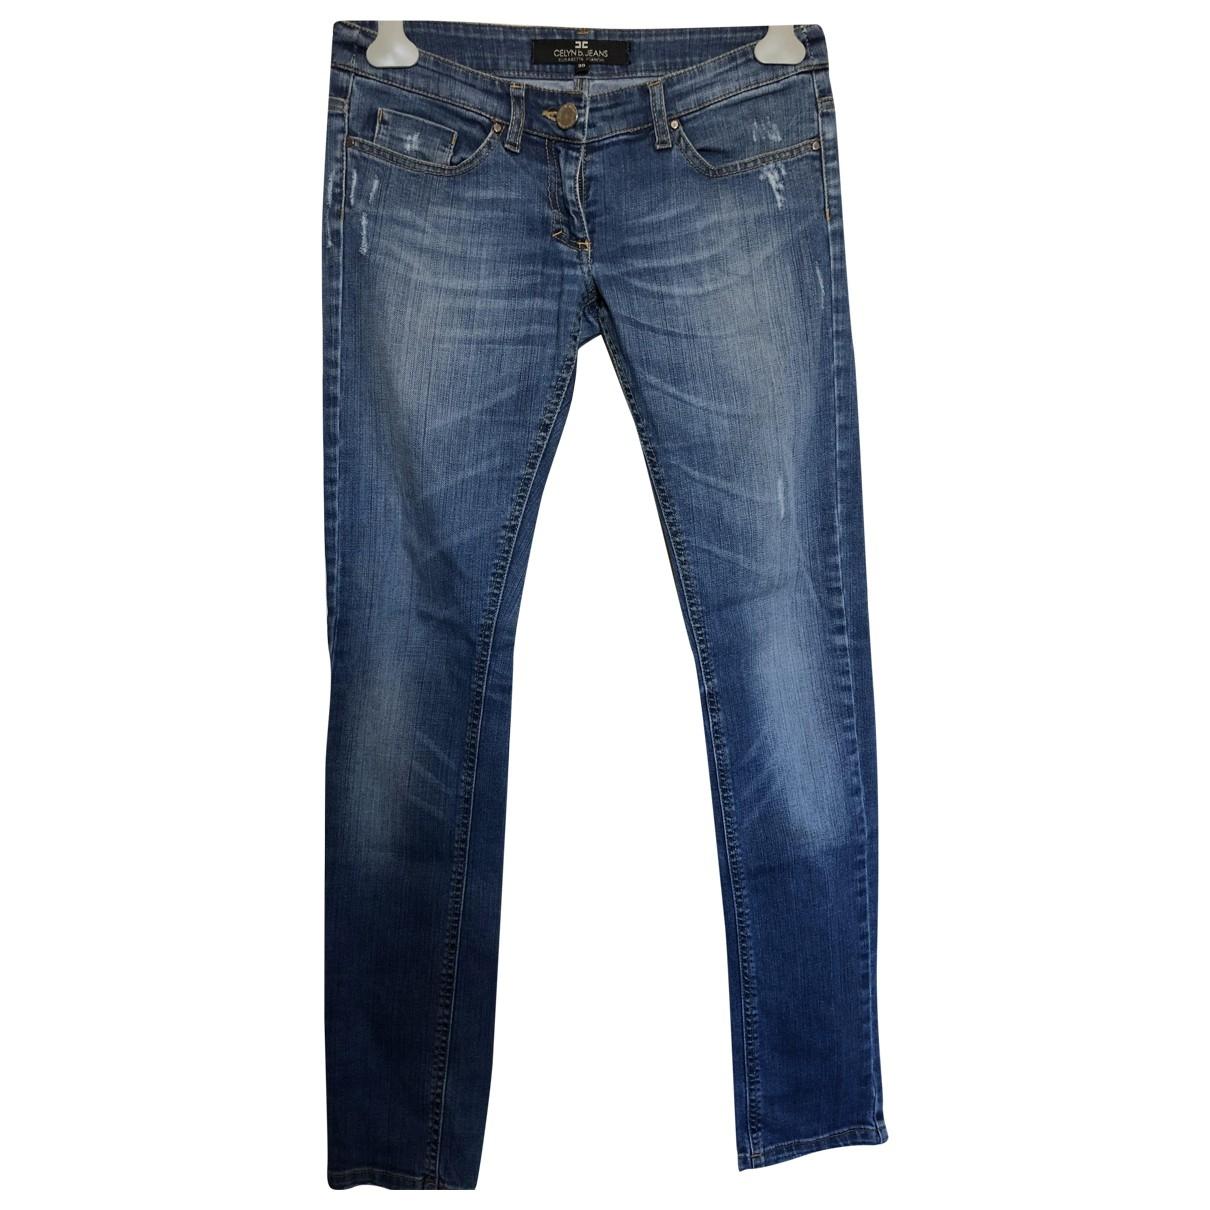 Elisabetta Franchi \N Blue Cotton - elasthane Jeans for Women 30 US